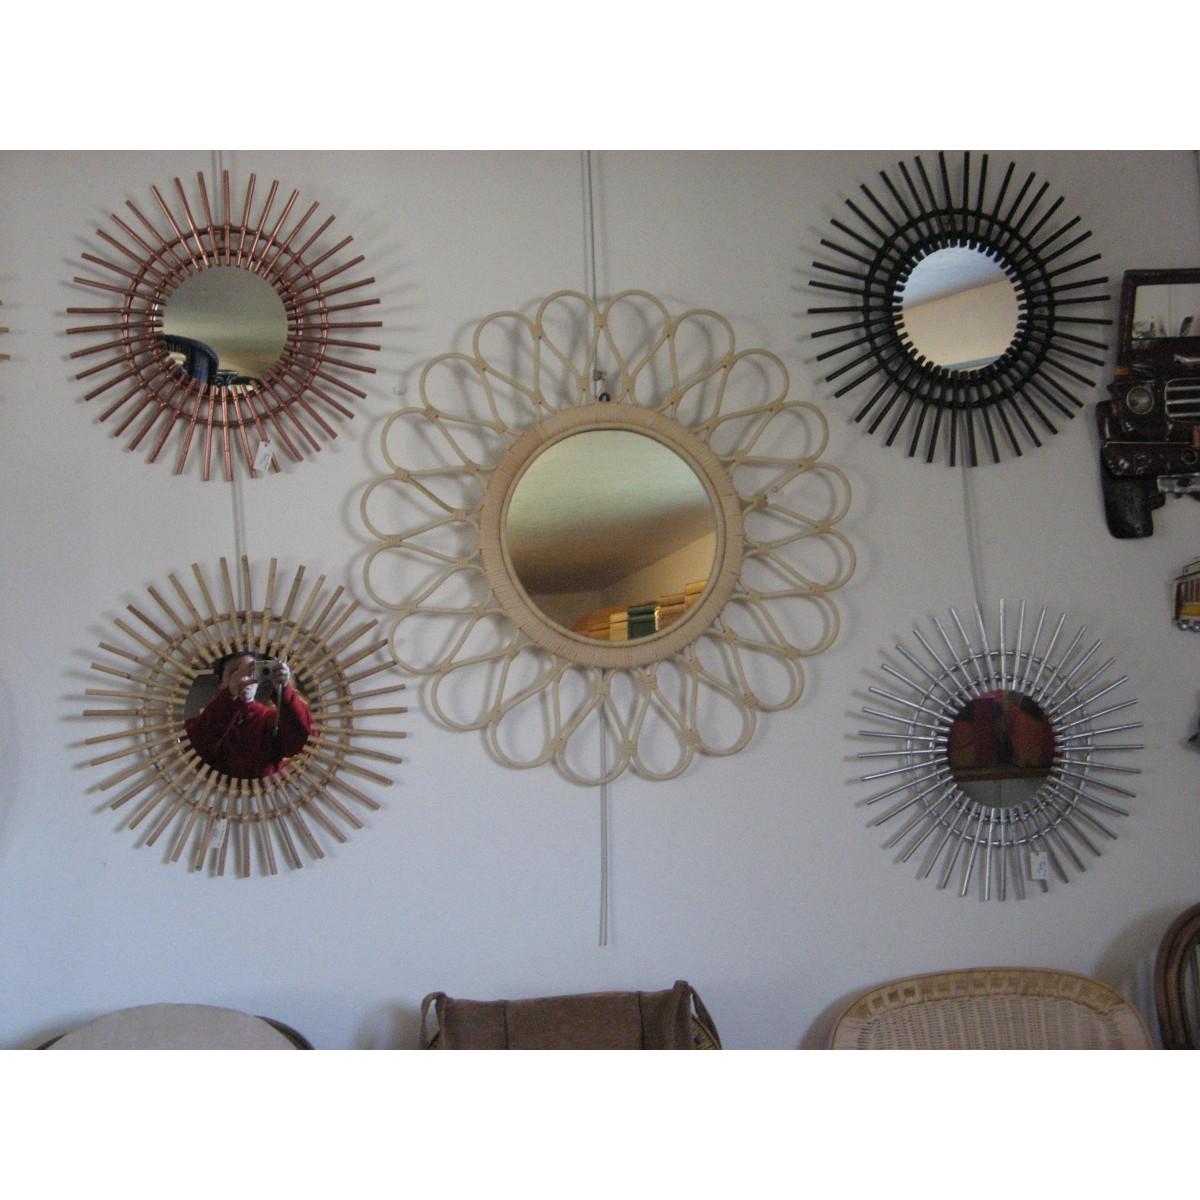 miroir rotin noir miroir rond avec encadrement en rotin clair miroir rotin miroir soleil. Black Bedroom Furniture Sets. Home Design Ideas